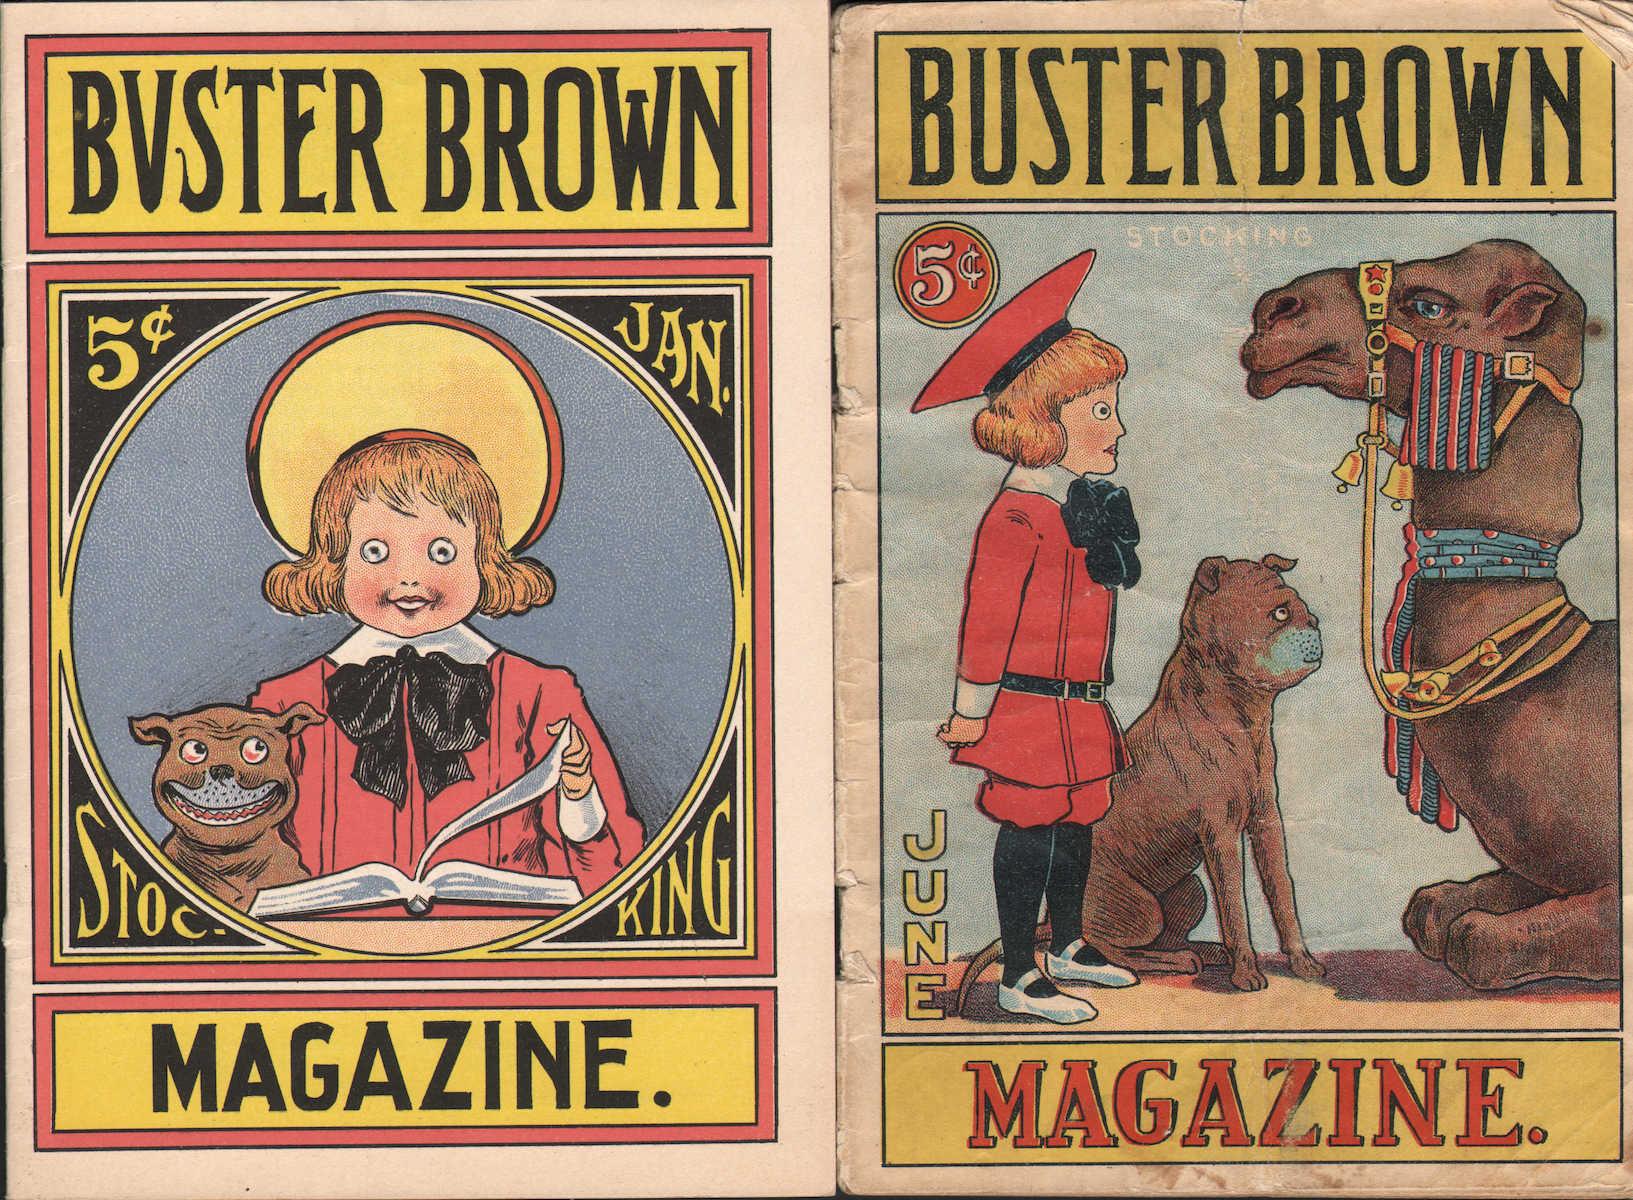 Buster Brown Stocking Magazine